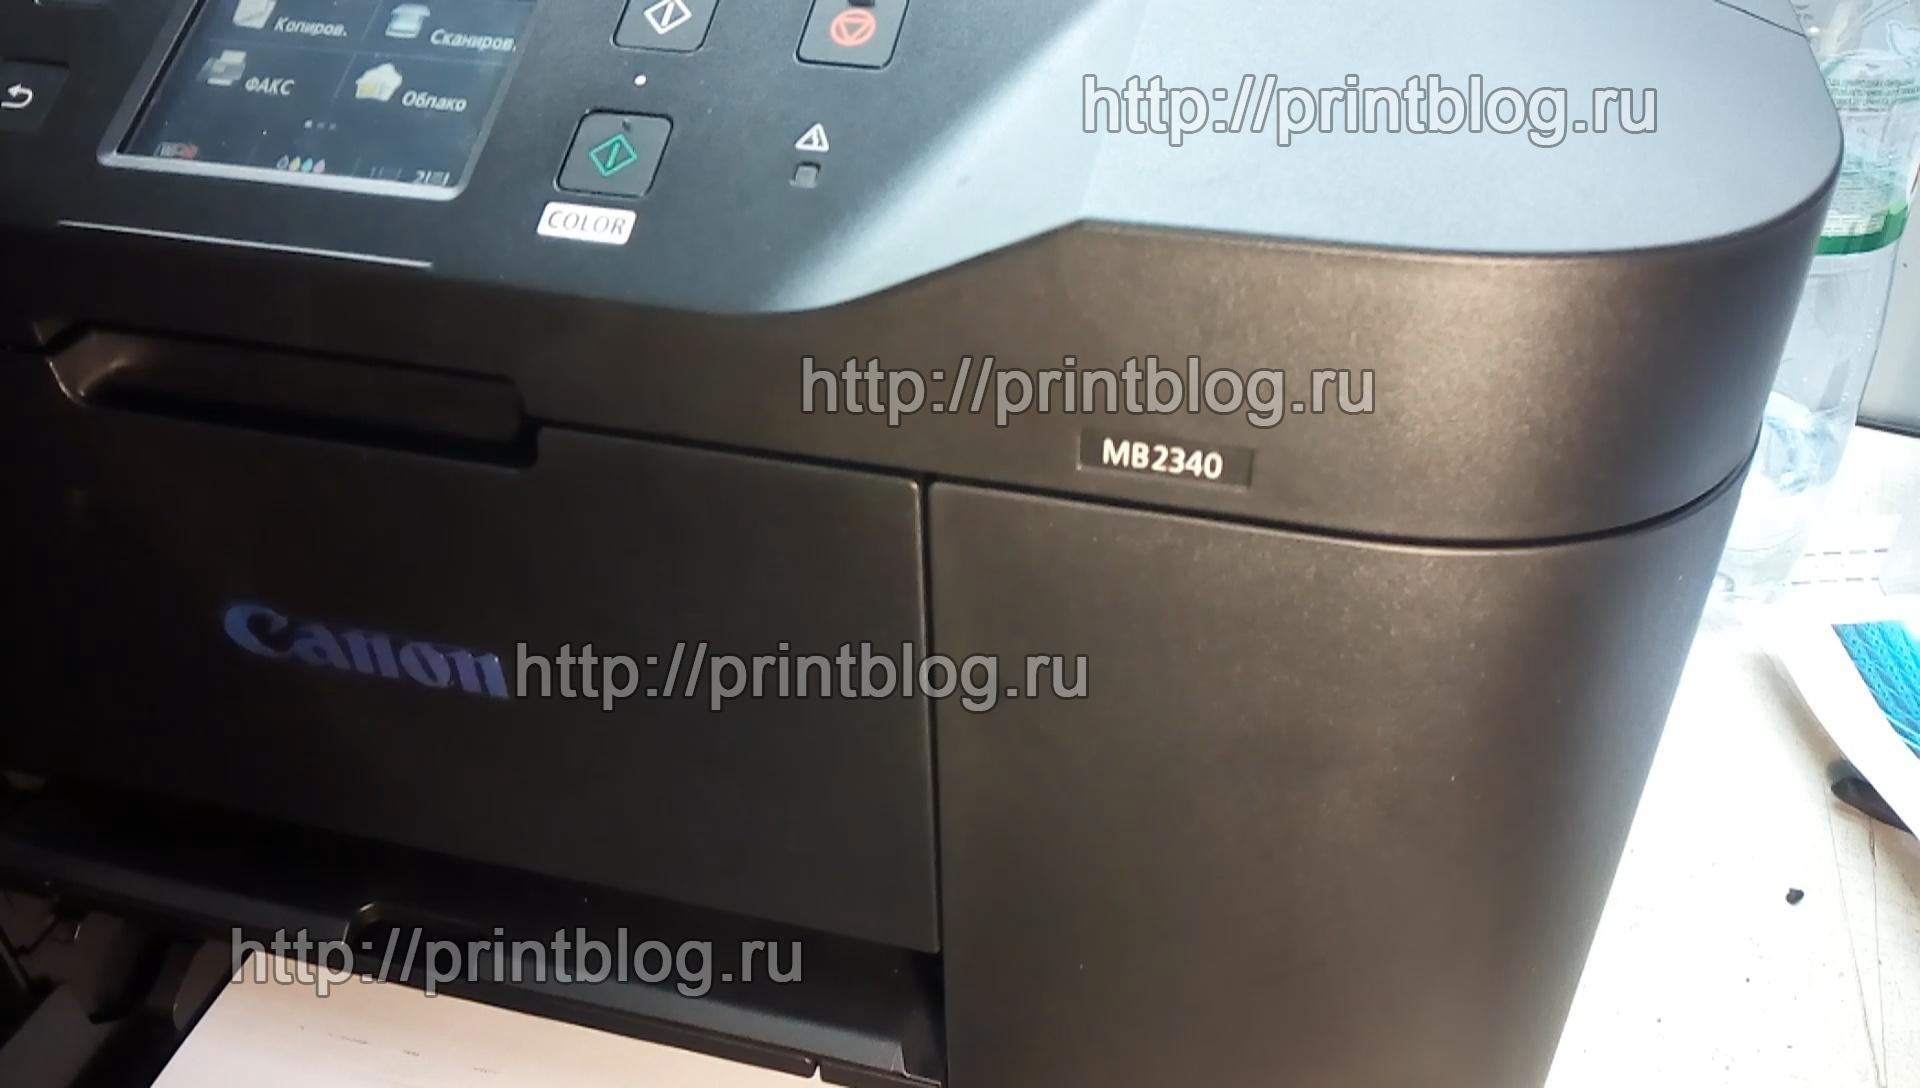 Как извлечь картриджи из принтера Canon MAXIFY MB2040, MB2340, MB5040, MB5340, iB4040 (картриджи PGI-1400, PGI-2400)